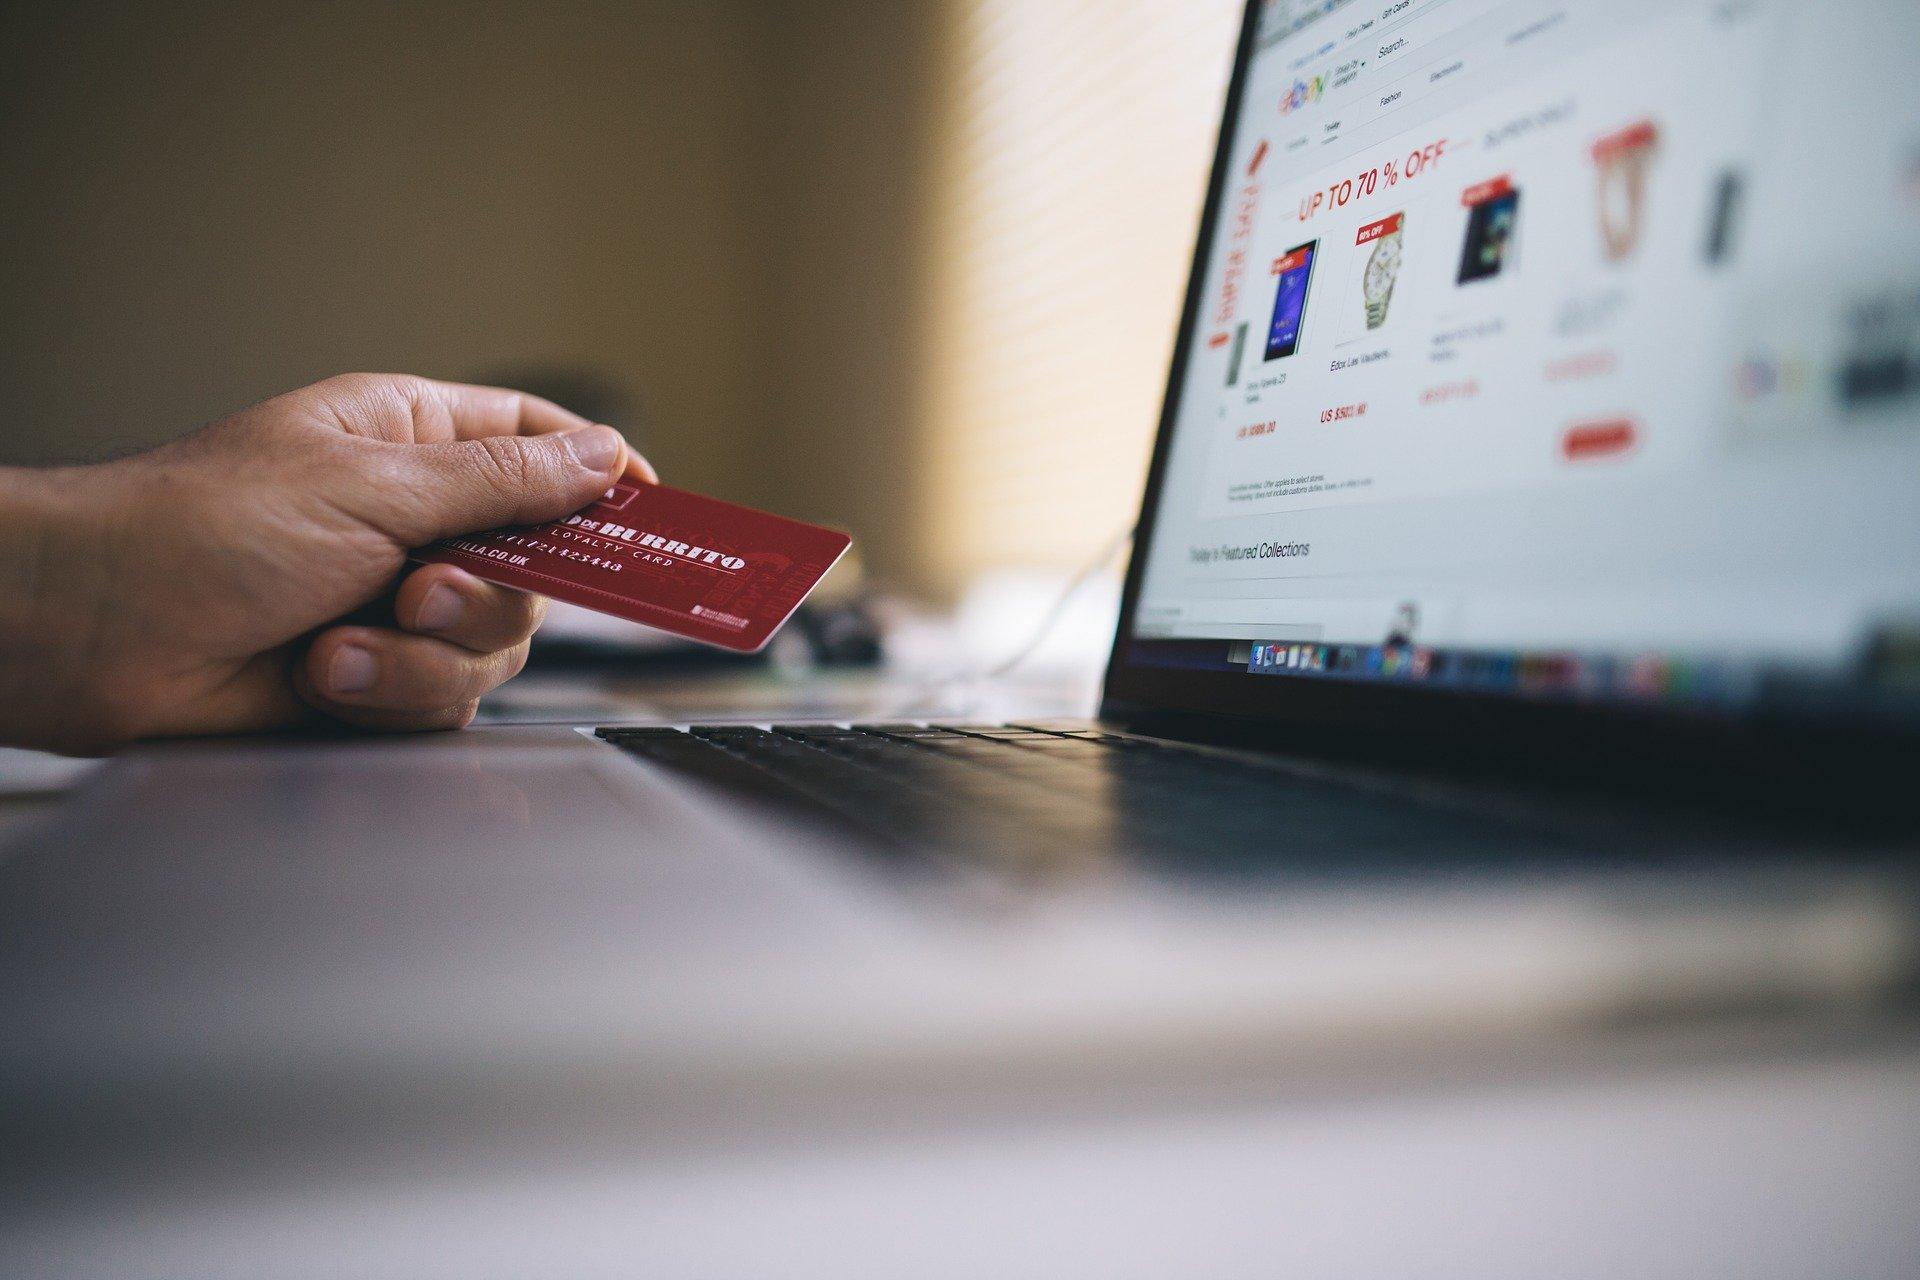 TrueCommerce completes acquisition of Netalogue Technologies